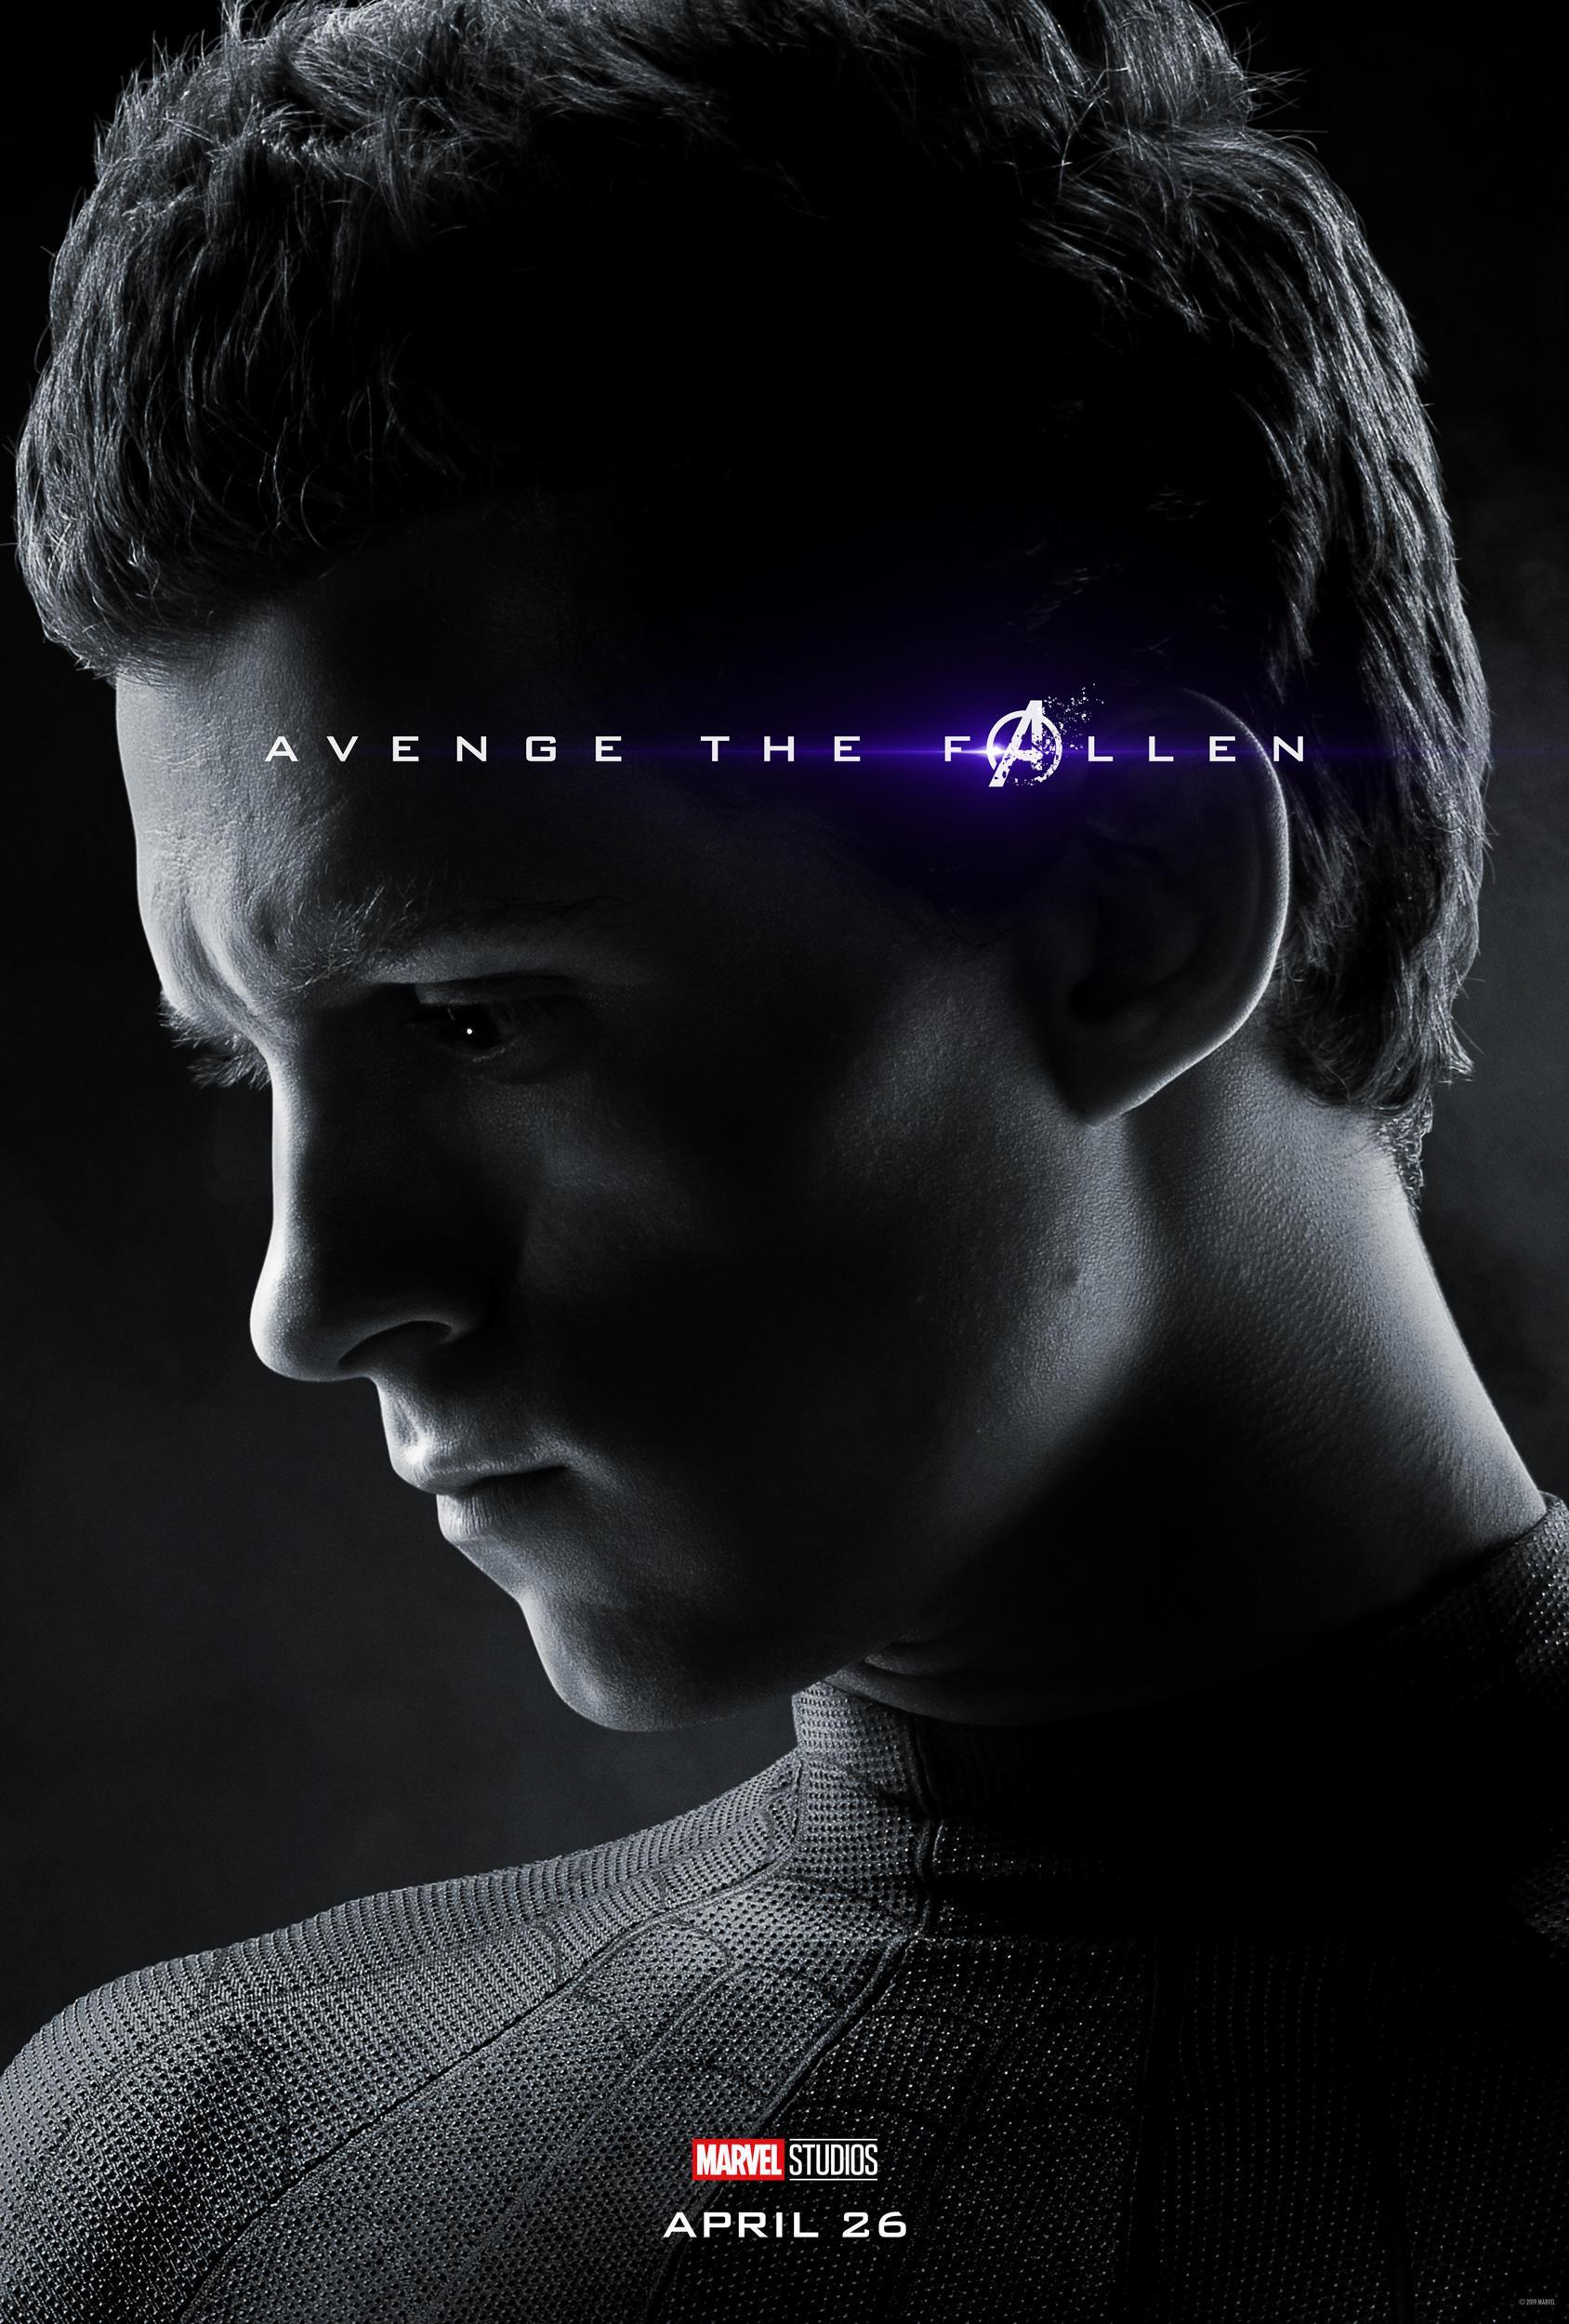 Avengers Endgame: US cinema chain to show all 22 MCU films